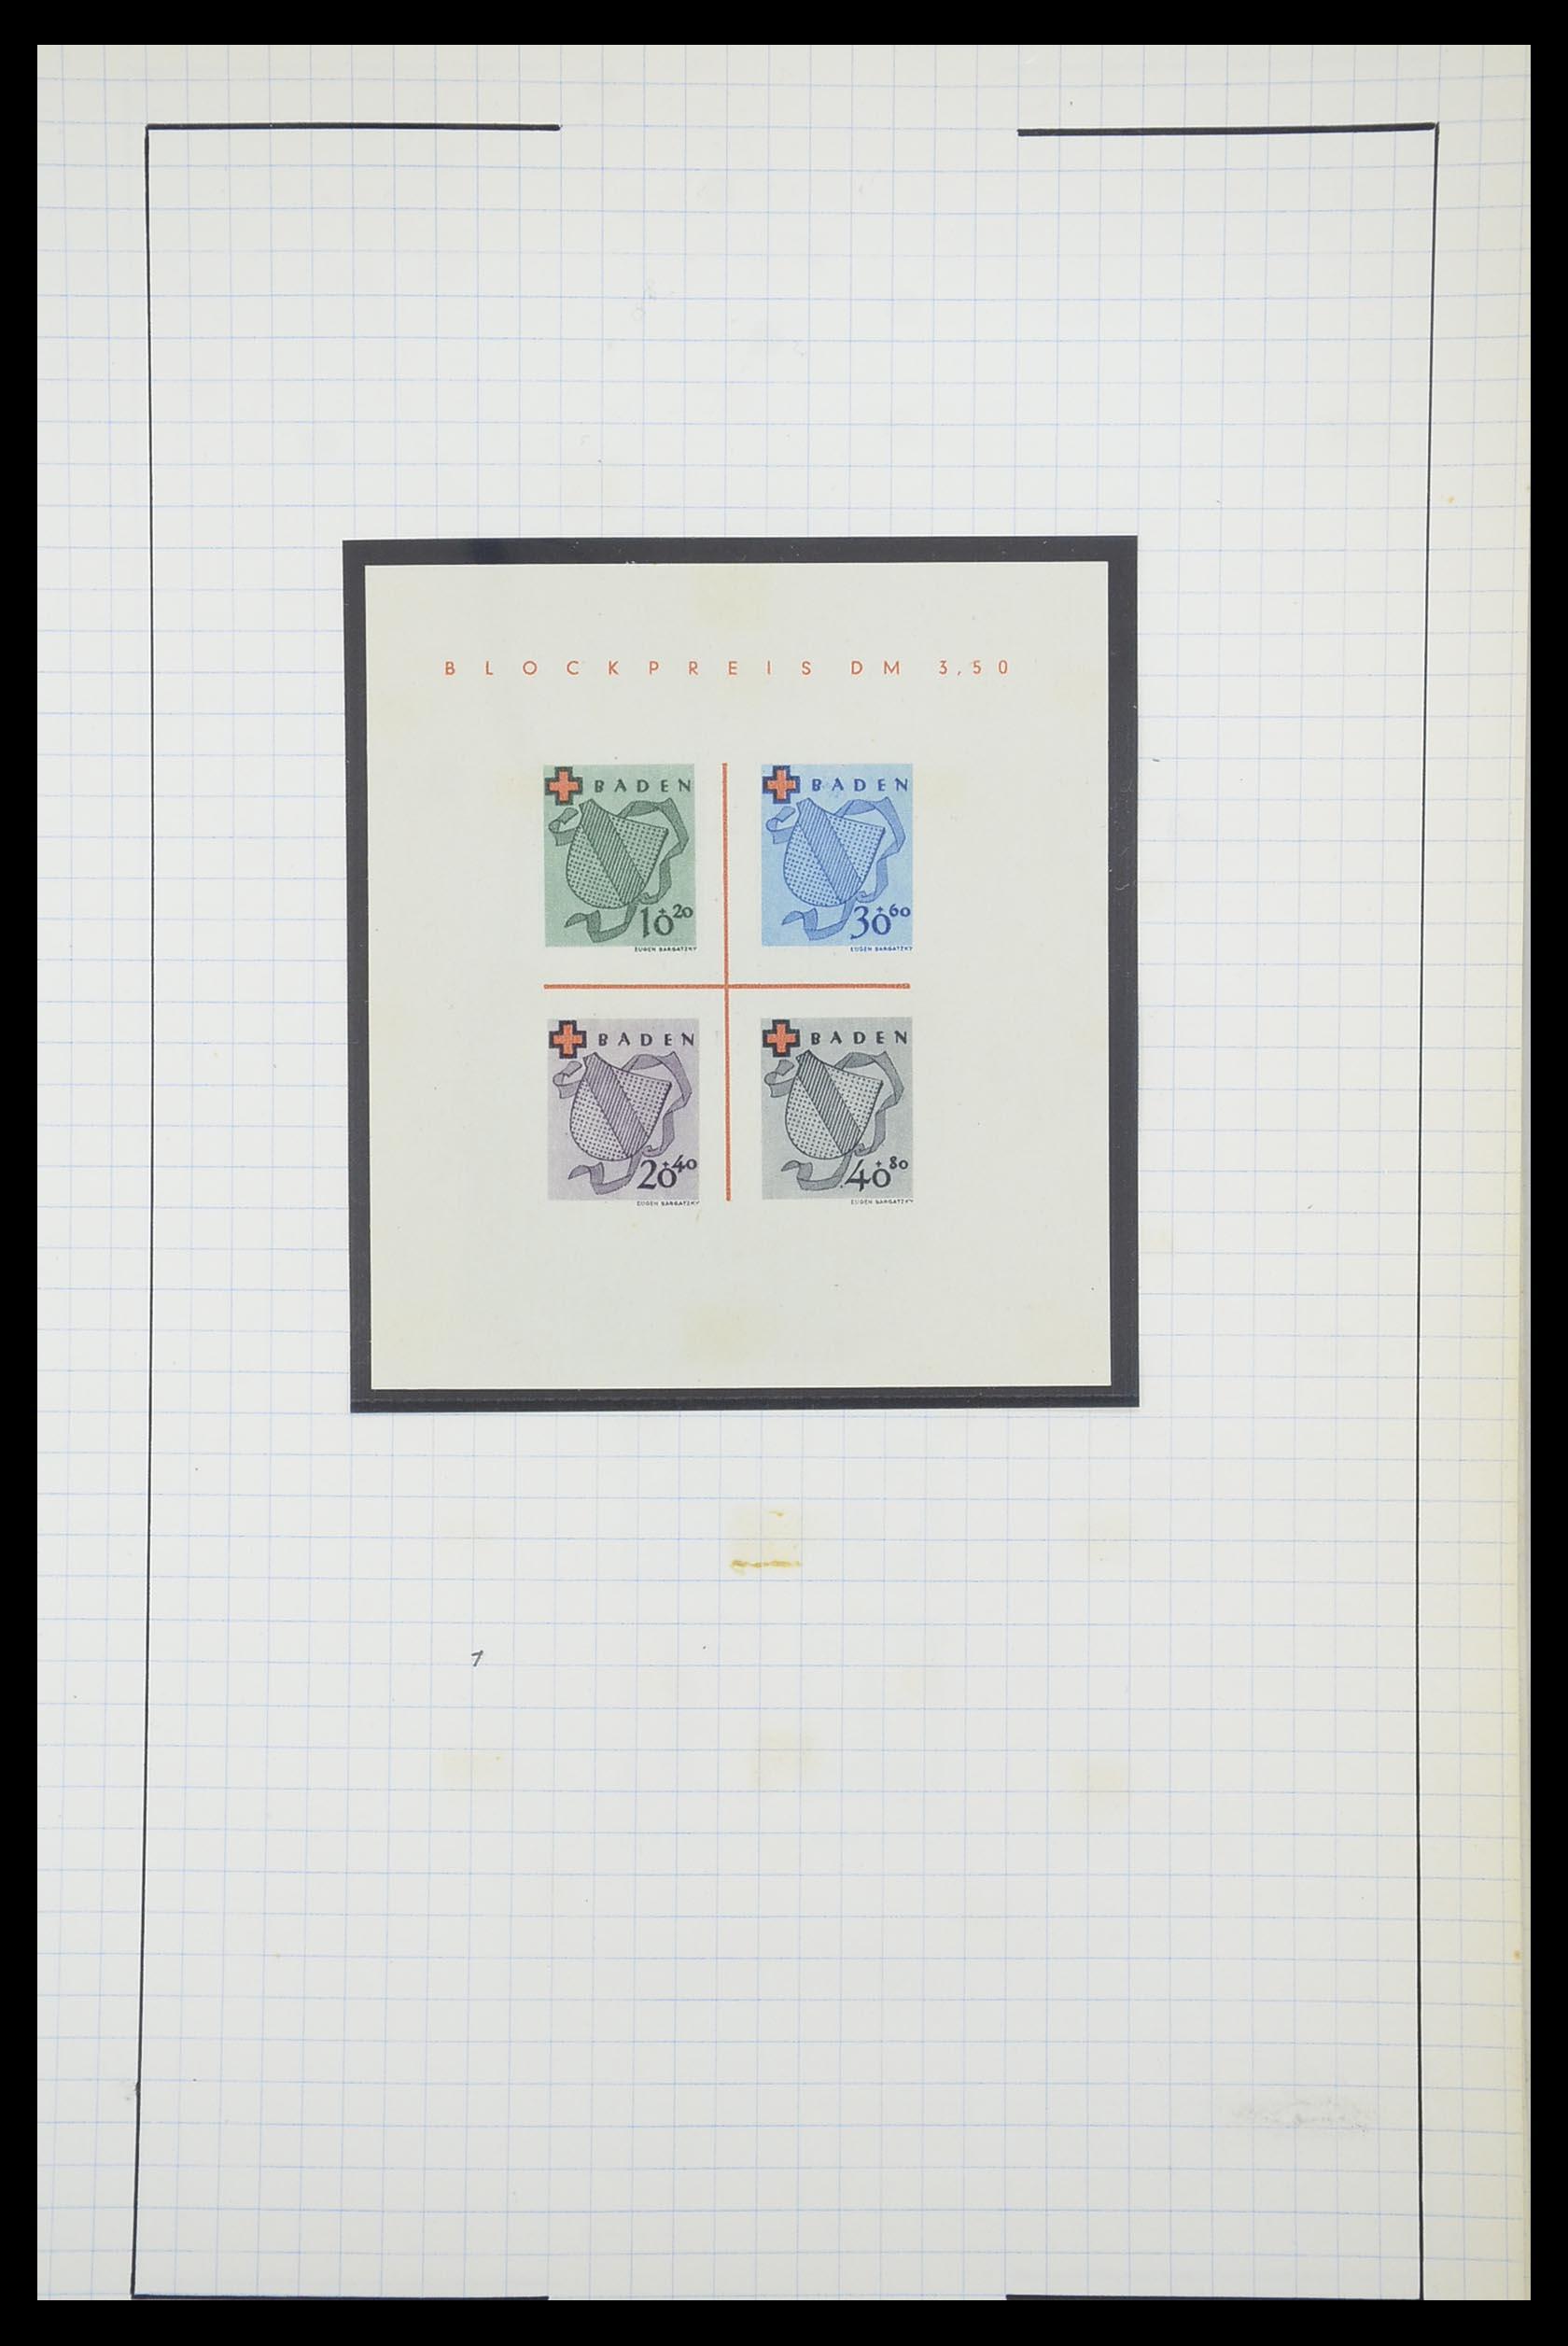 33864 012 - Postzegelverzameling 33864 Franse Zone 1945-1949.